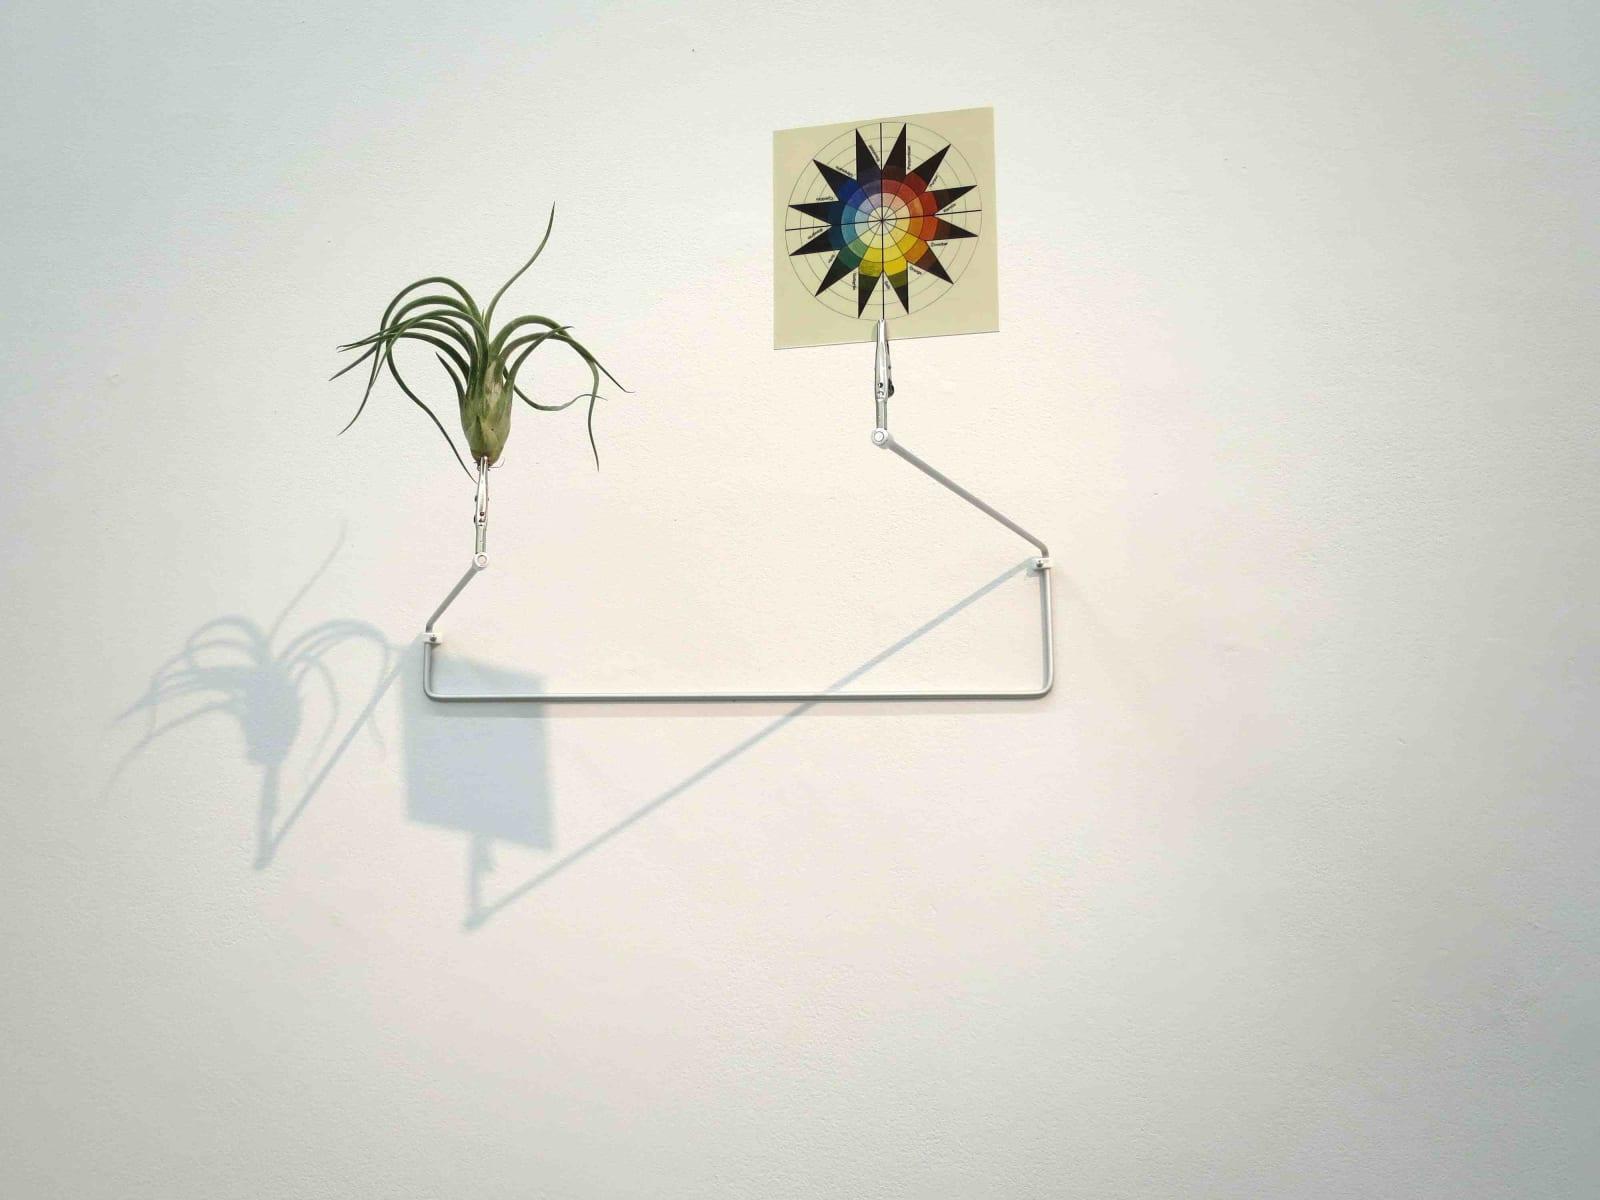 ULRICH VOGL, TWO FRIENDS, 2016